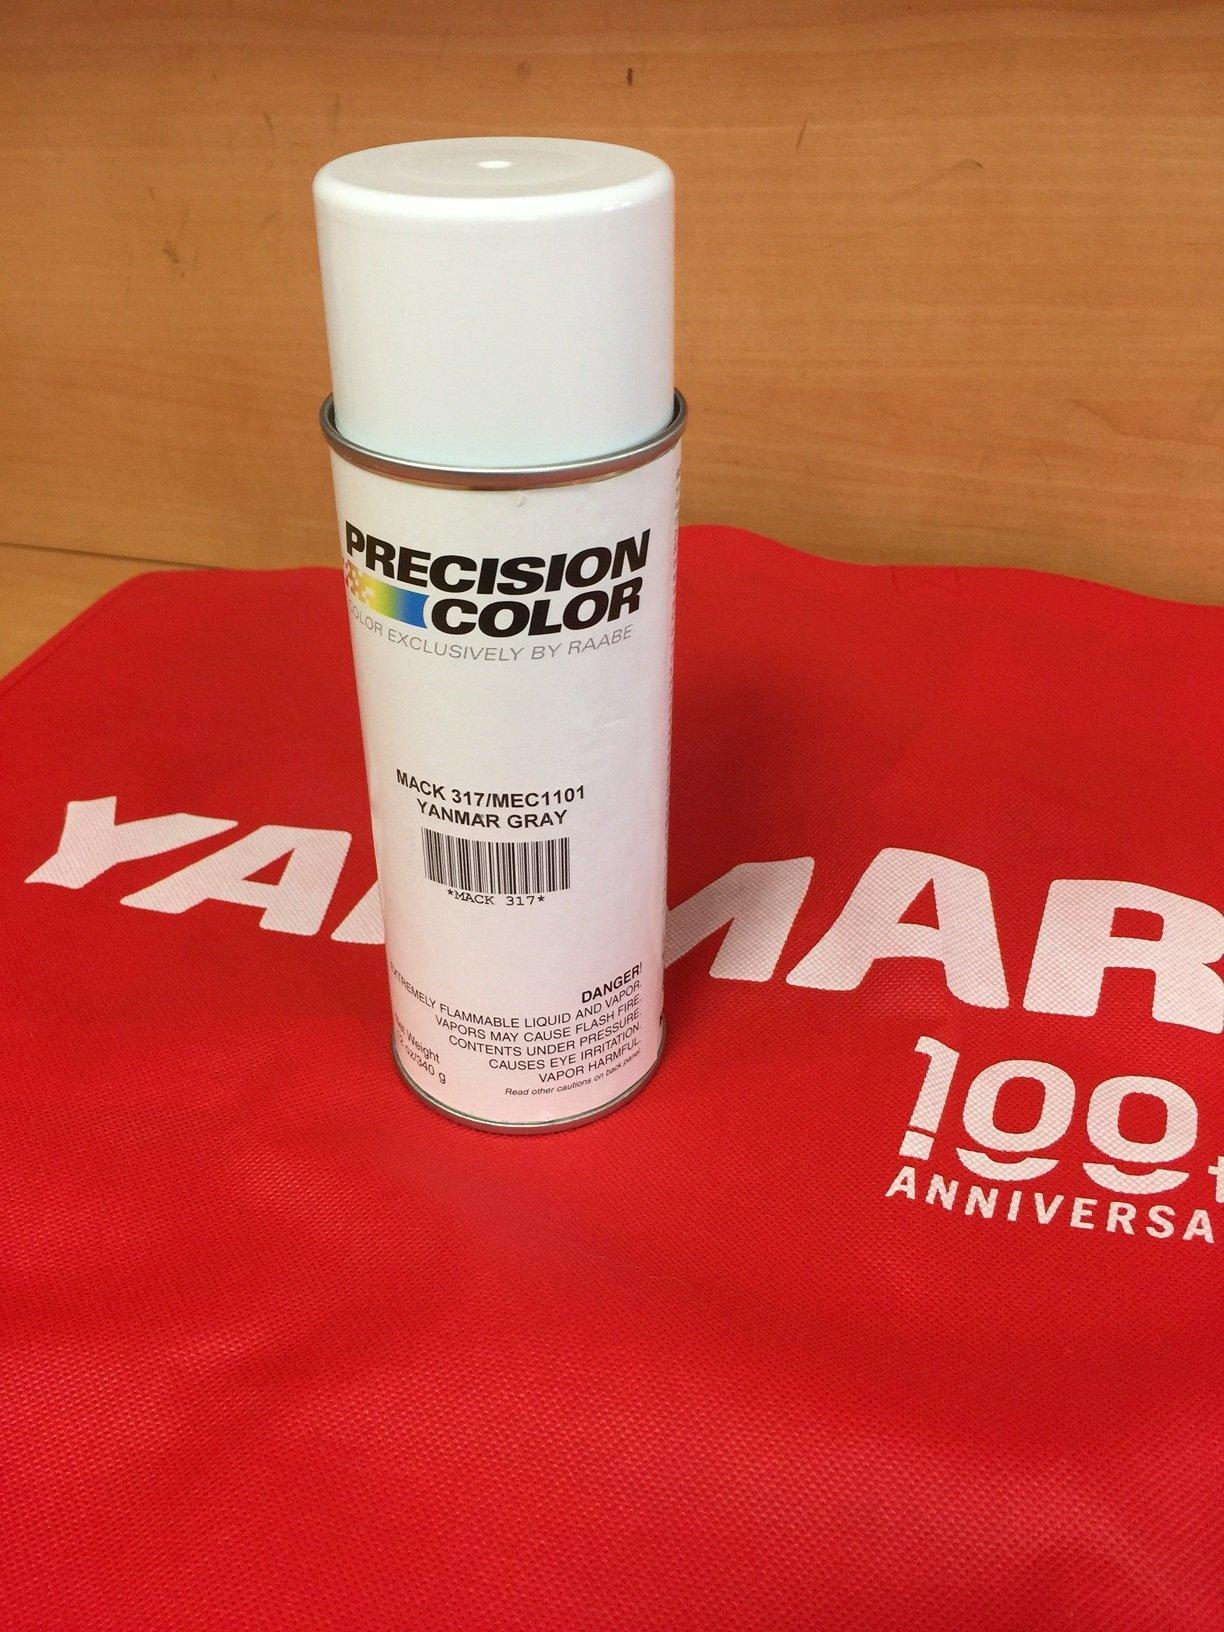 Genuine YANMAR MARINE GRAY SPRAY PAINT MACK317 / MEC1101 12 OZ